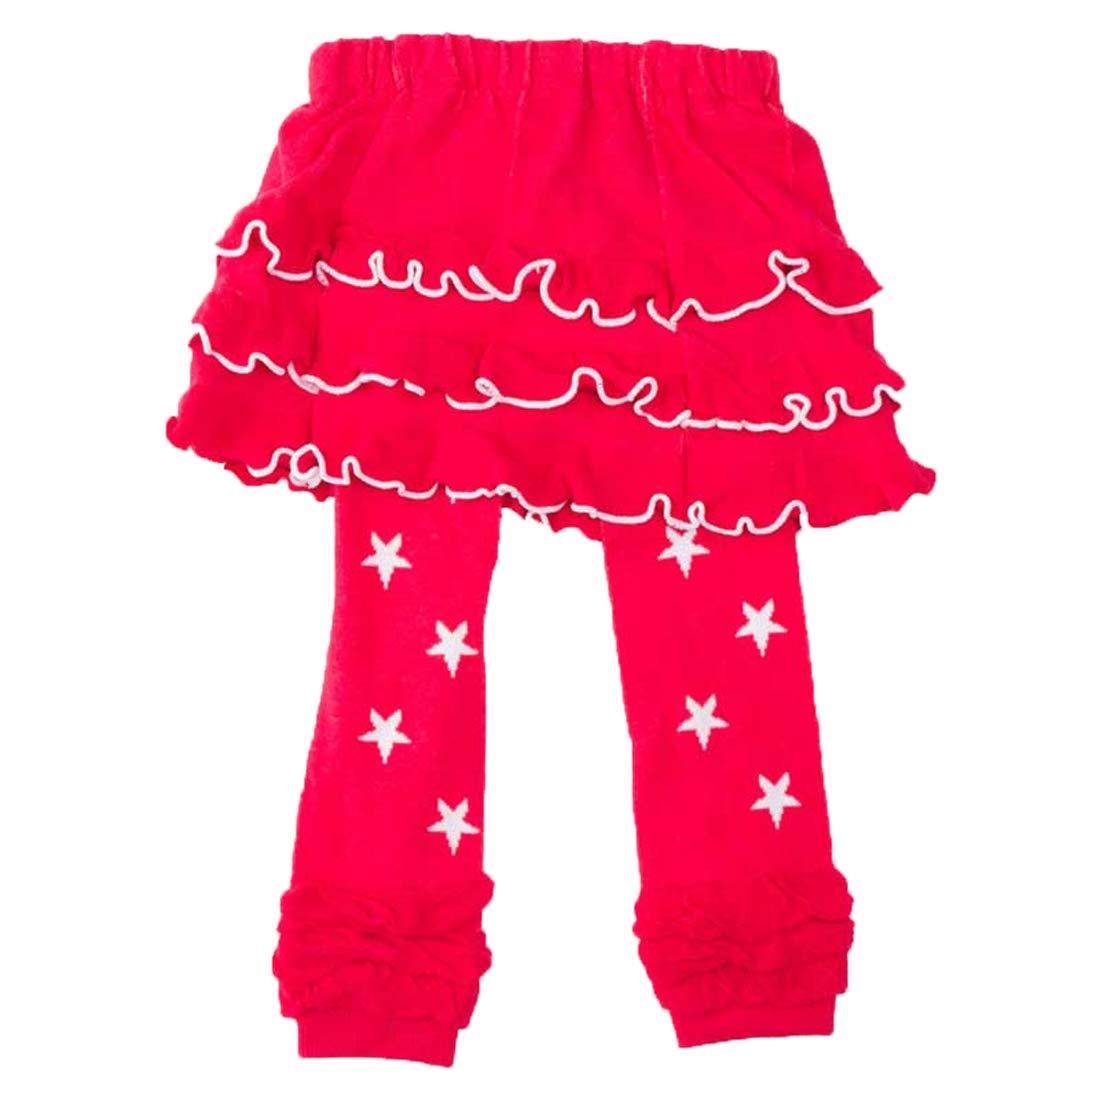 SKEANIE Skirtle Red Stars 2 to 3 Years